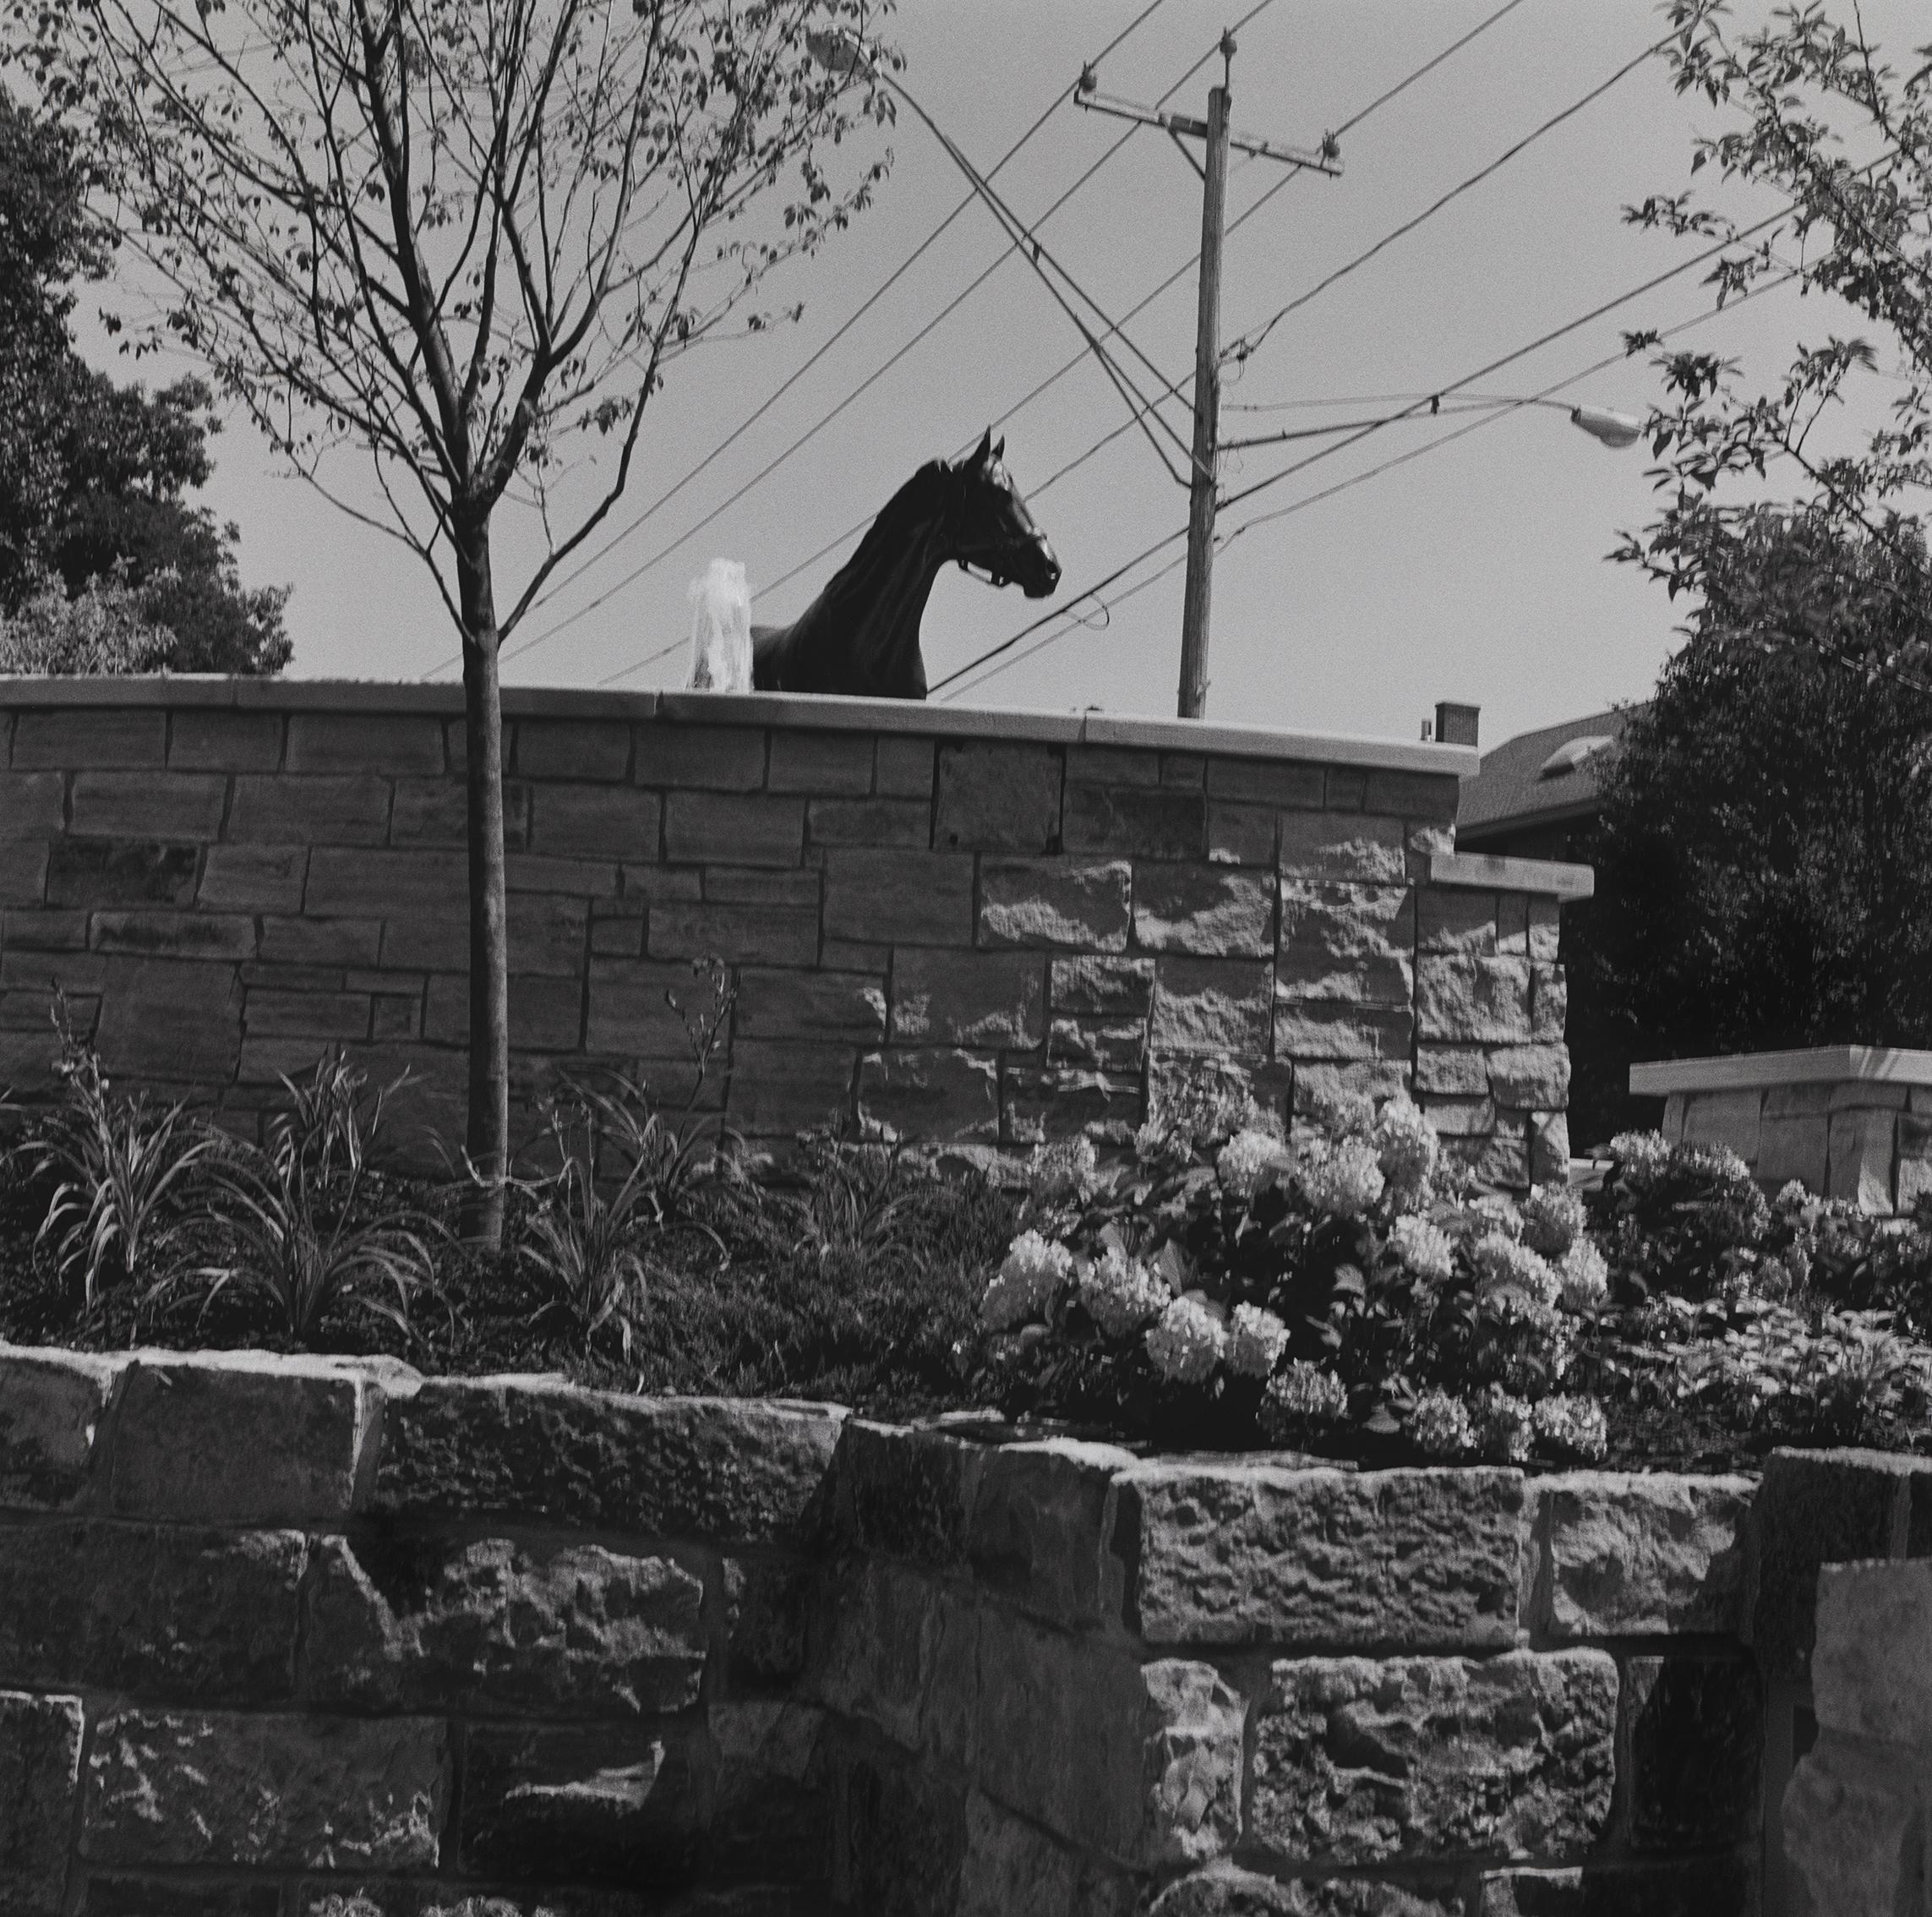 Saratoga Park, Horse Statue, Saratoga Springs, New York, 2015